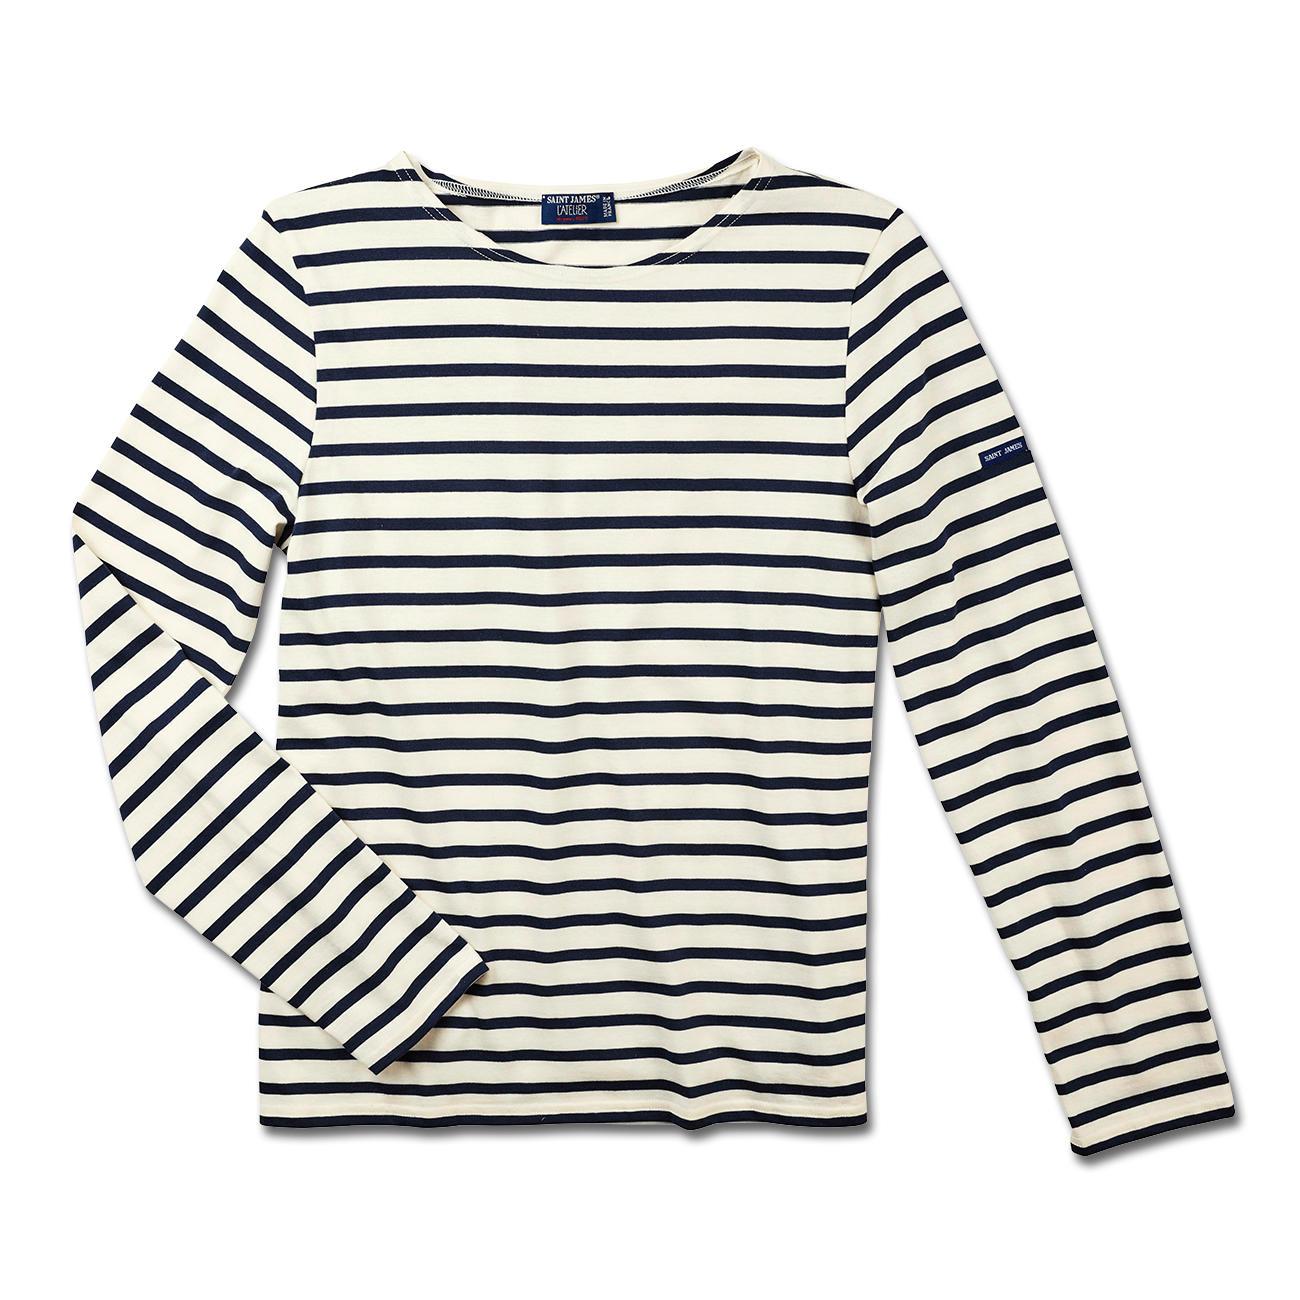 new styles 06be0 2e300 Herren-Bretagne-Langarm-Shirt oder T-Shirt entdecken